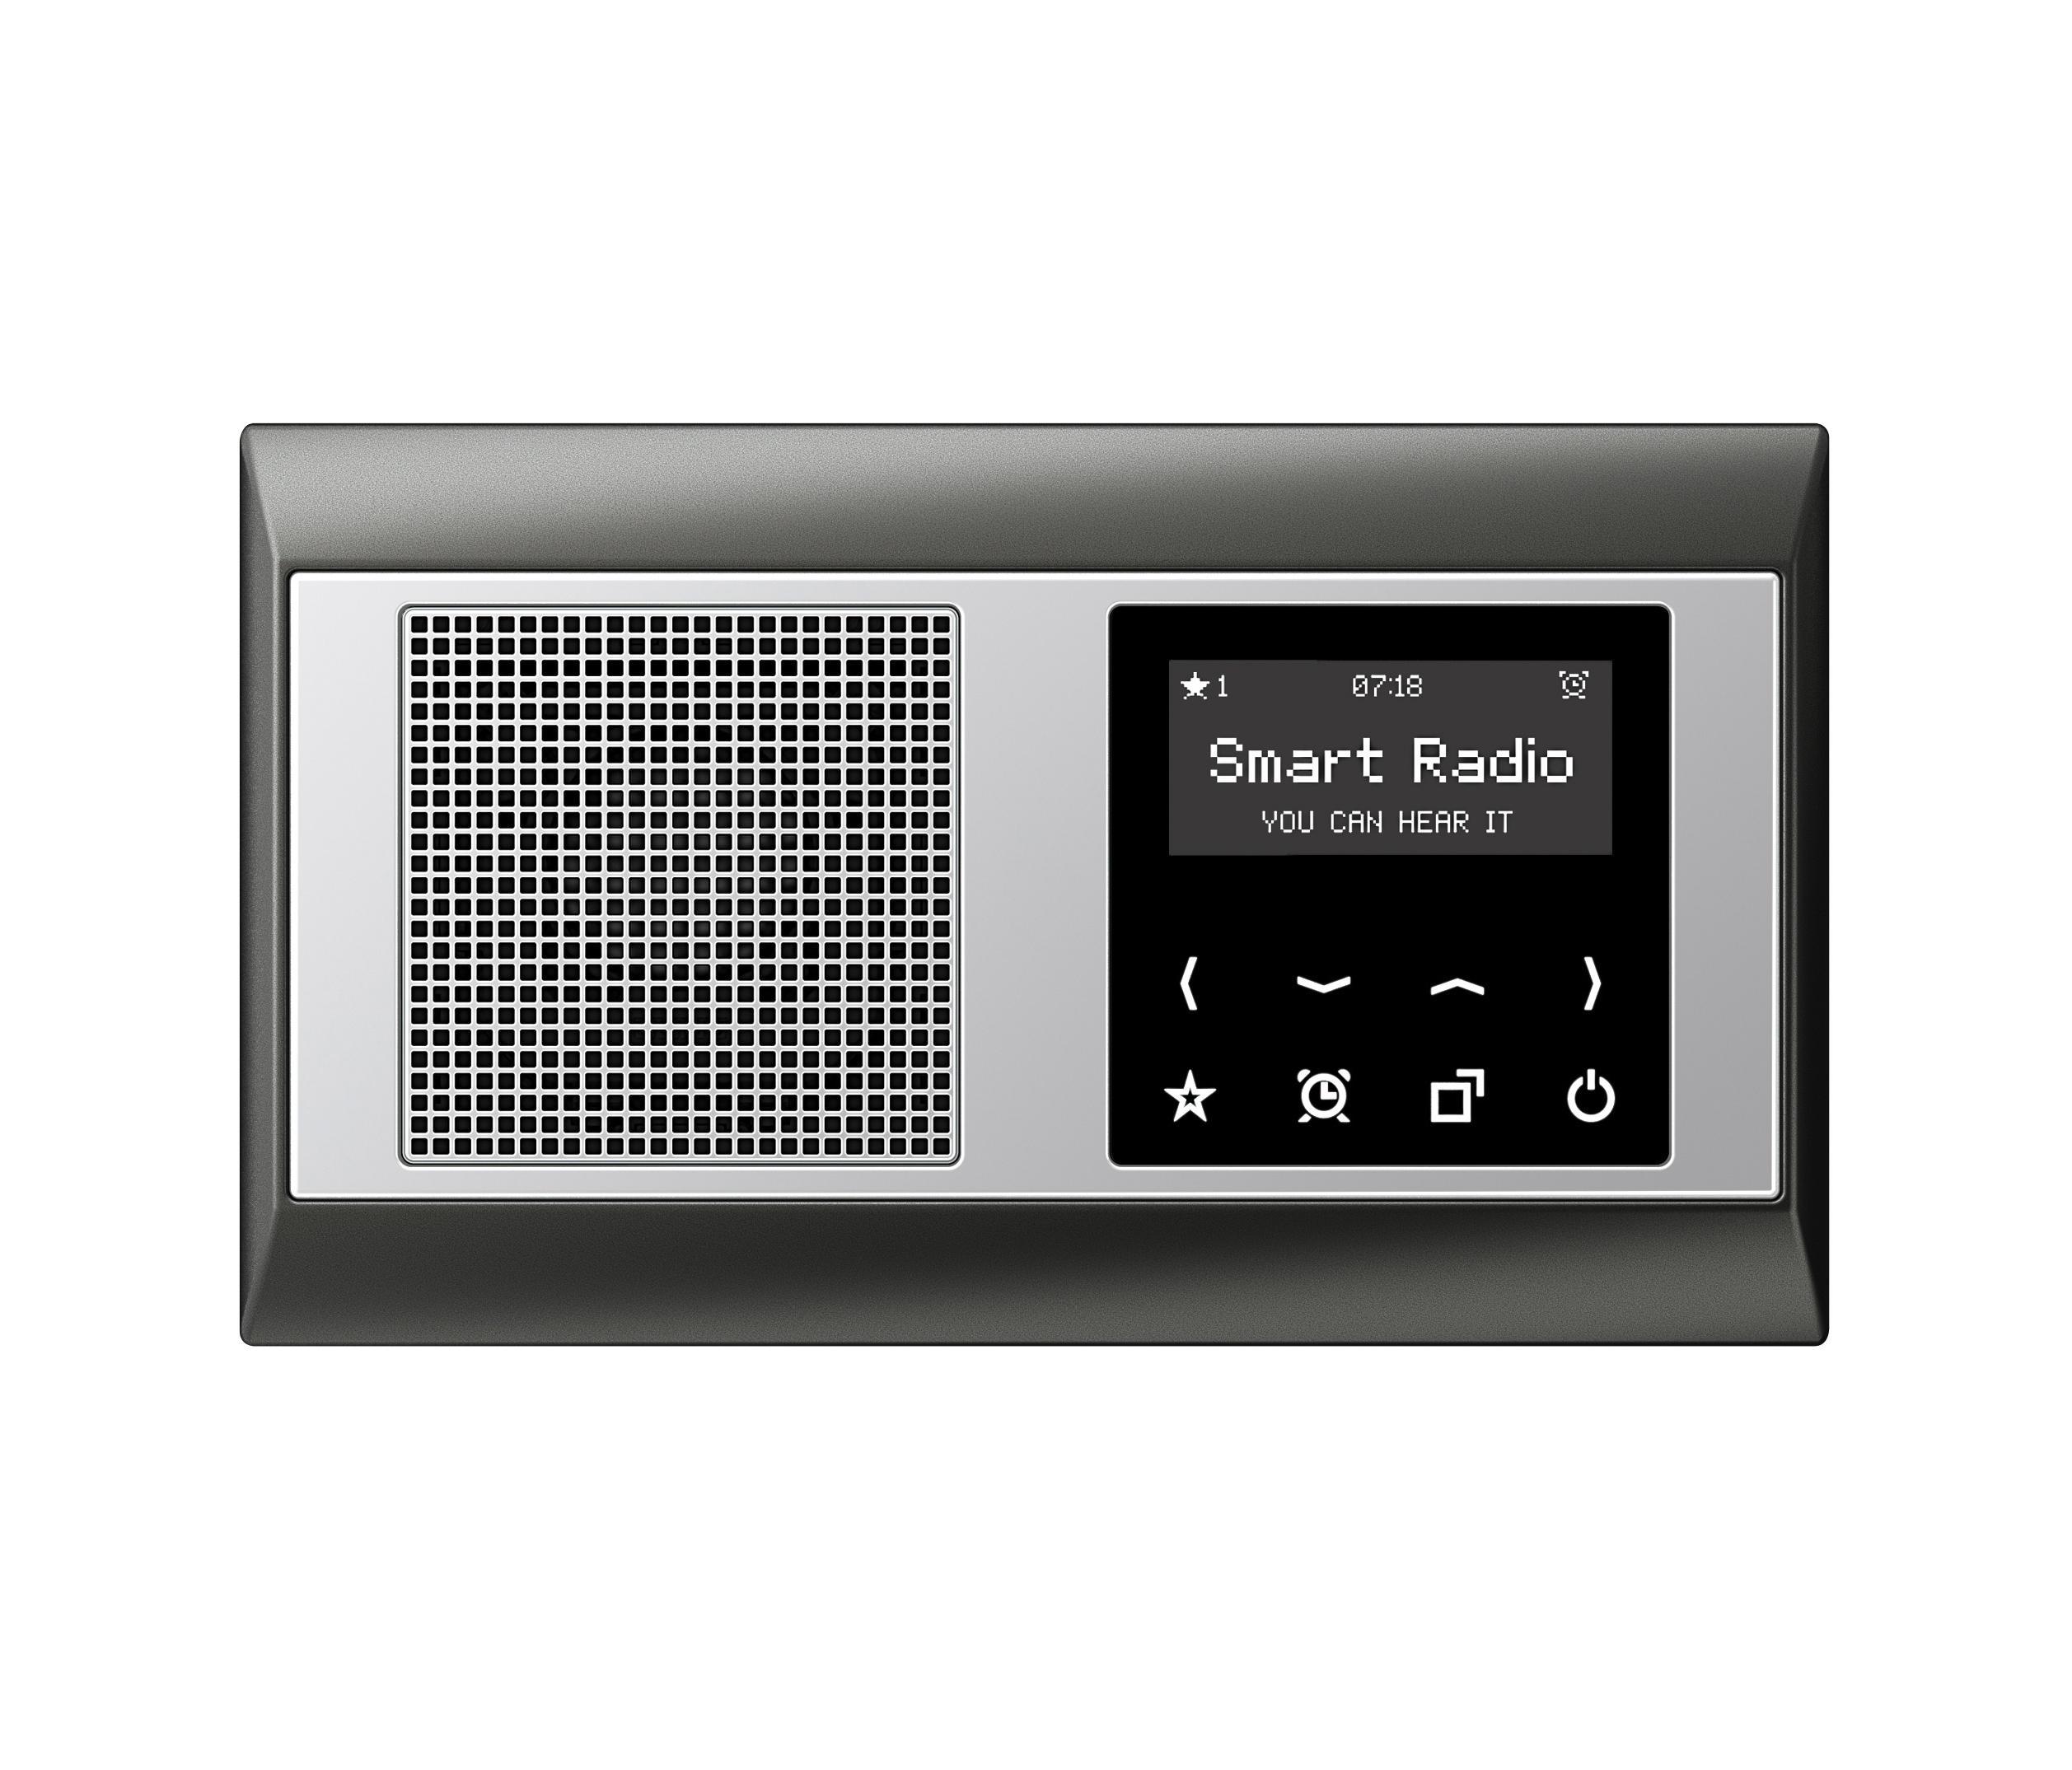 smart radio a plus soundmanagement multimedia von jung. Black Bedroom Furniture Sets. Home Design Ideas